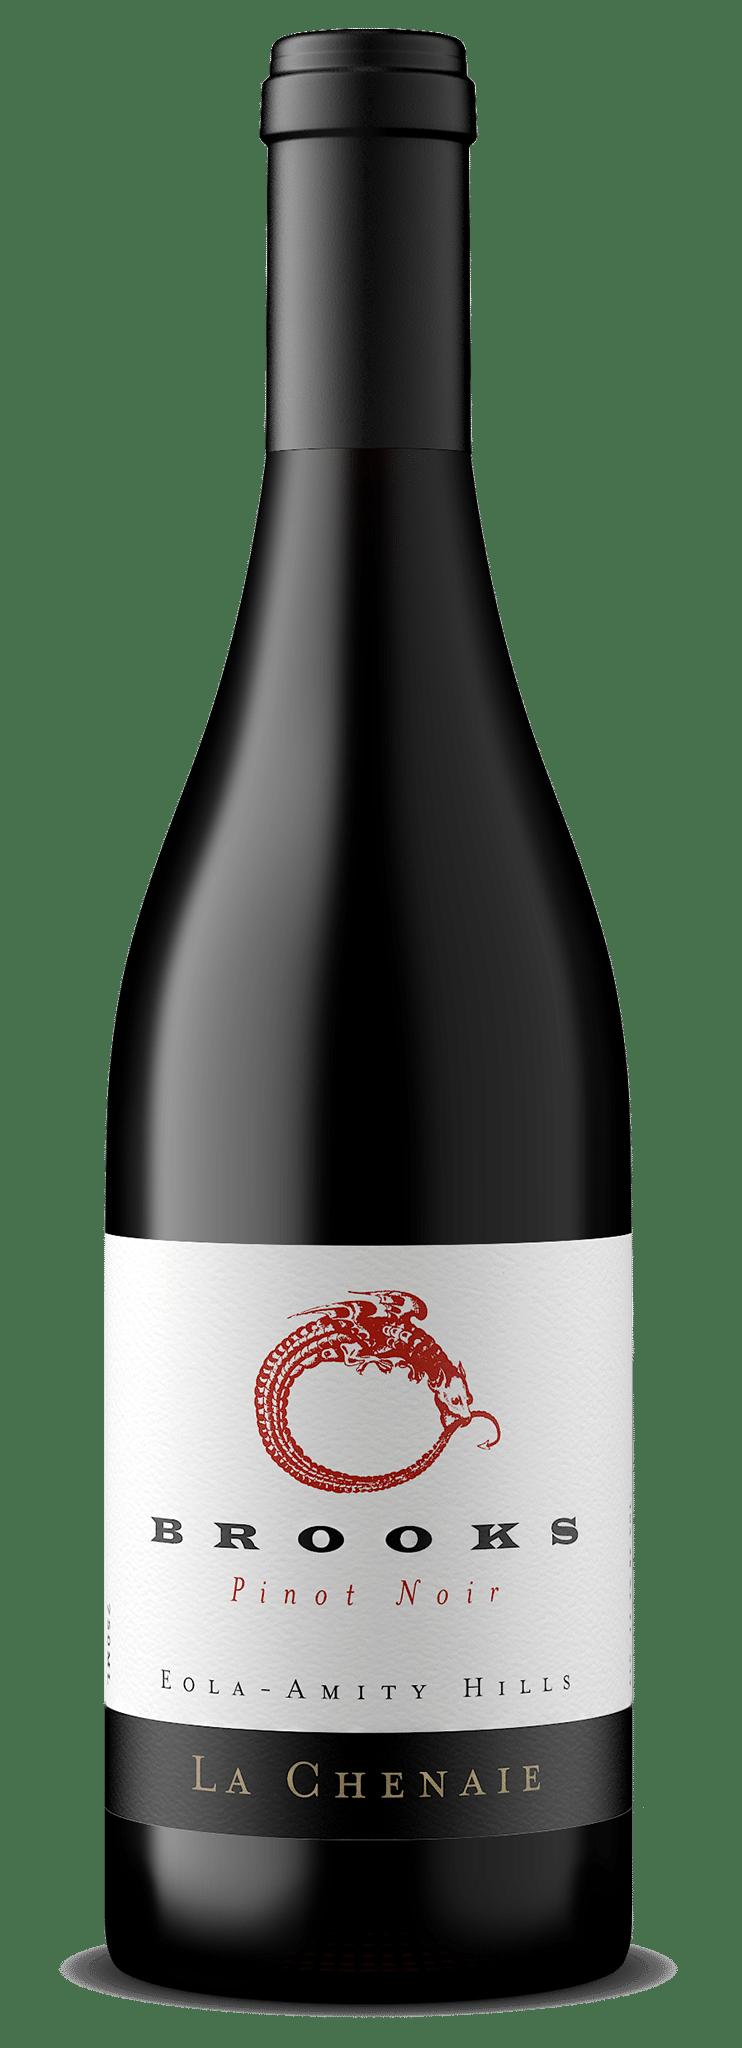 2017 La Chenaie Pinot Noir